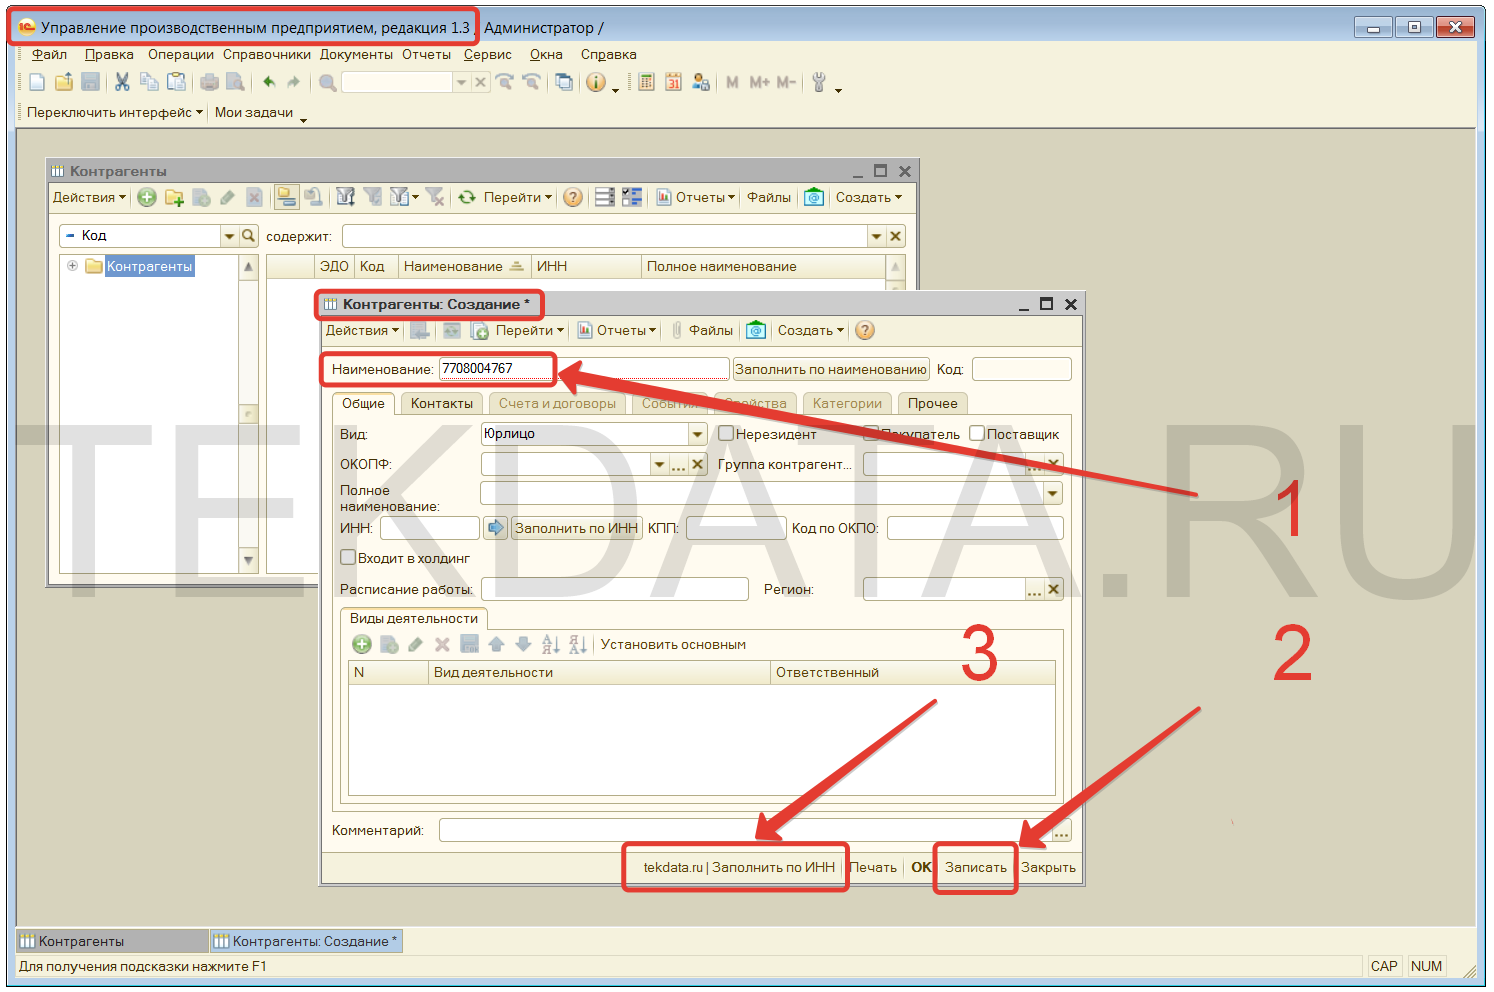 Заполнение контрагентов по ИНН в УПП 1.3 (Действия 1-2-3) | tekdata.ru